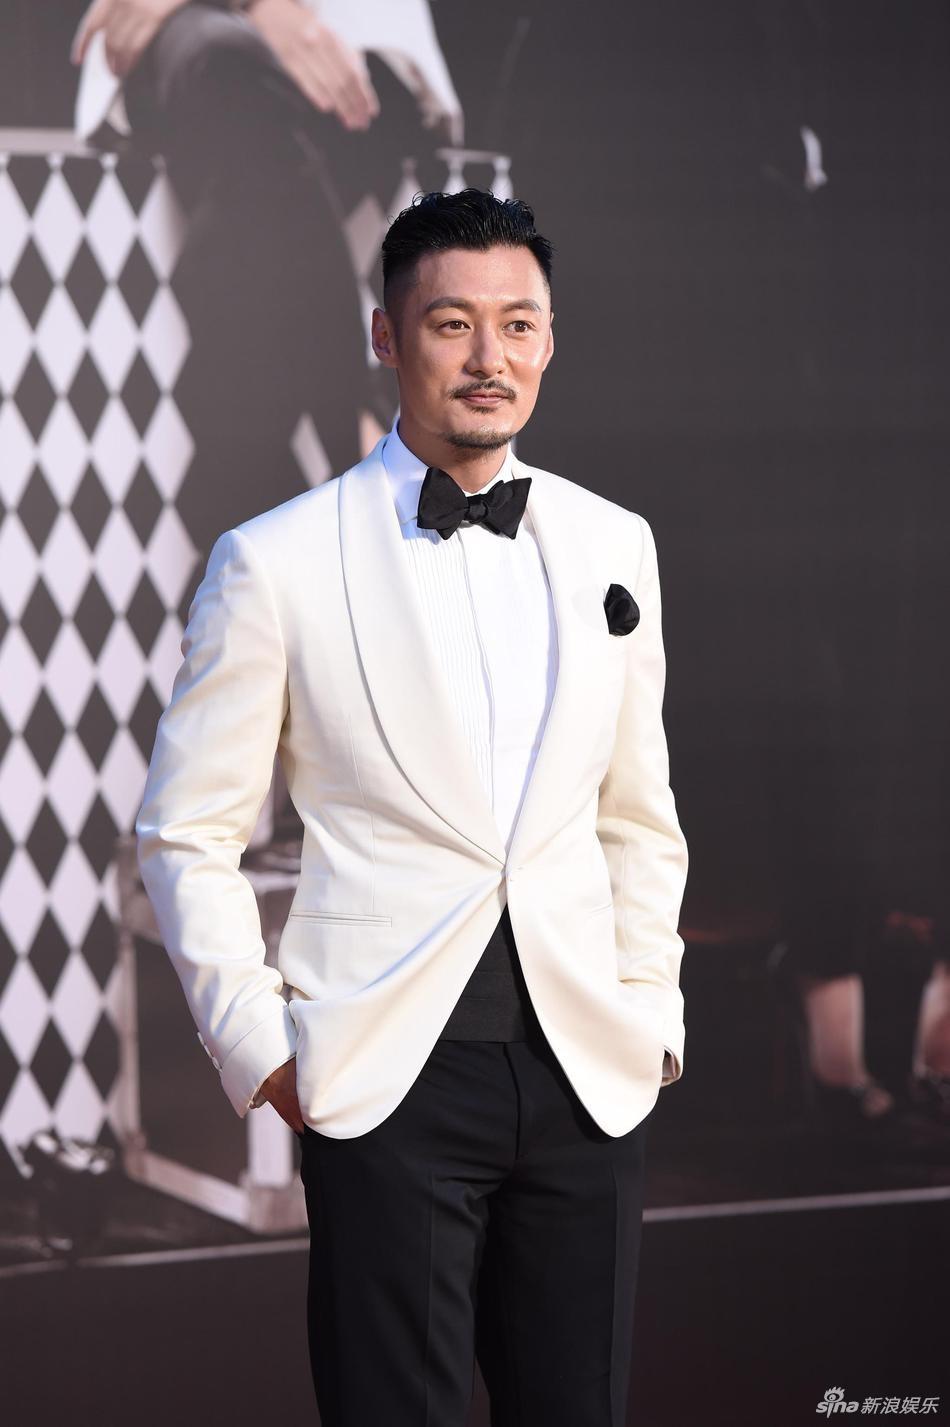 Dan sao Trung Quoc du tham do Kim Tuong, Chau Tinh Tri vang mat hinh anh 16